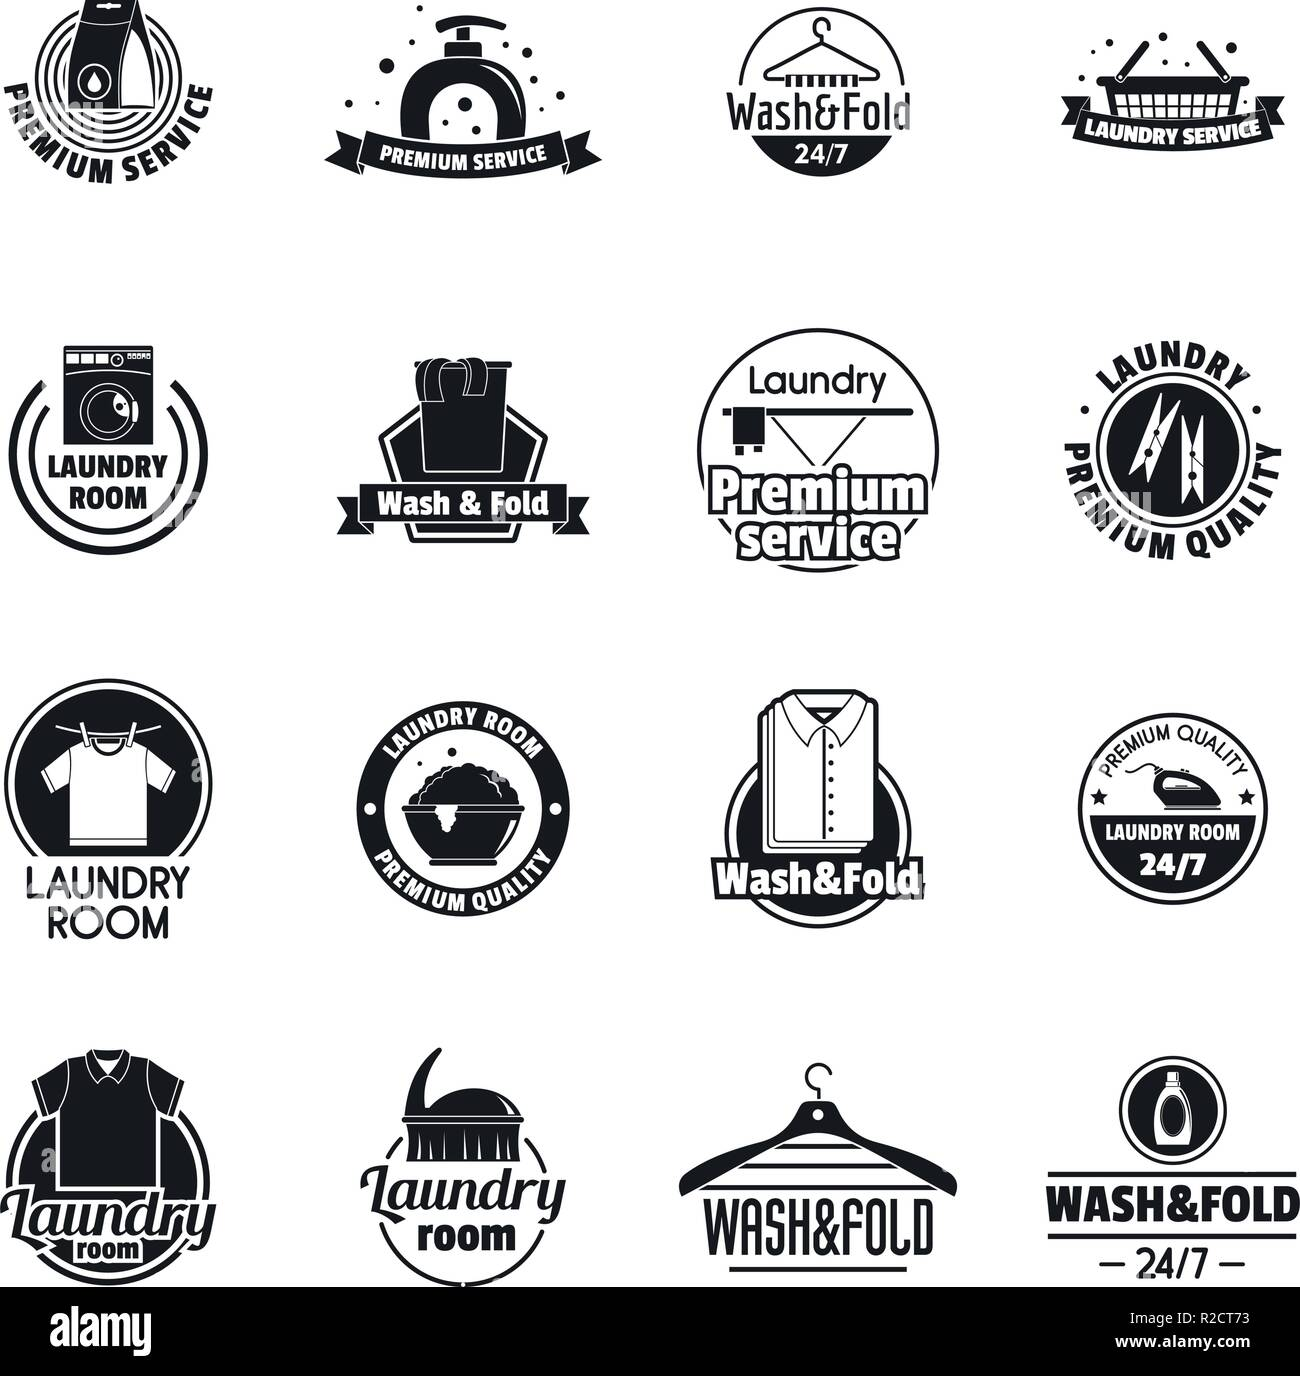 Washing Machine Logo Stock Photos & Washing Machine Logo ...